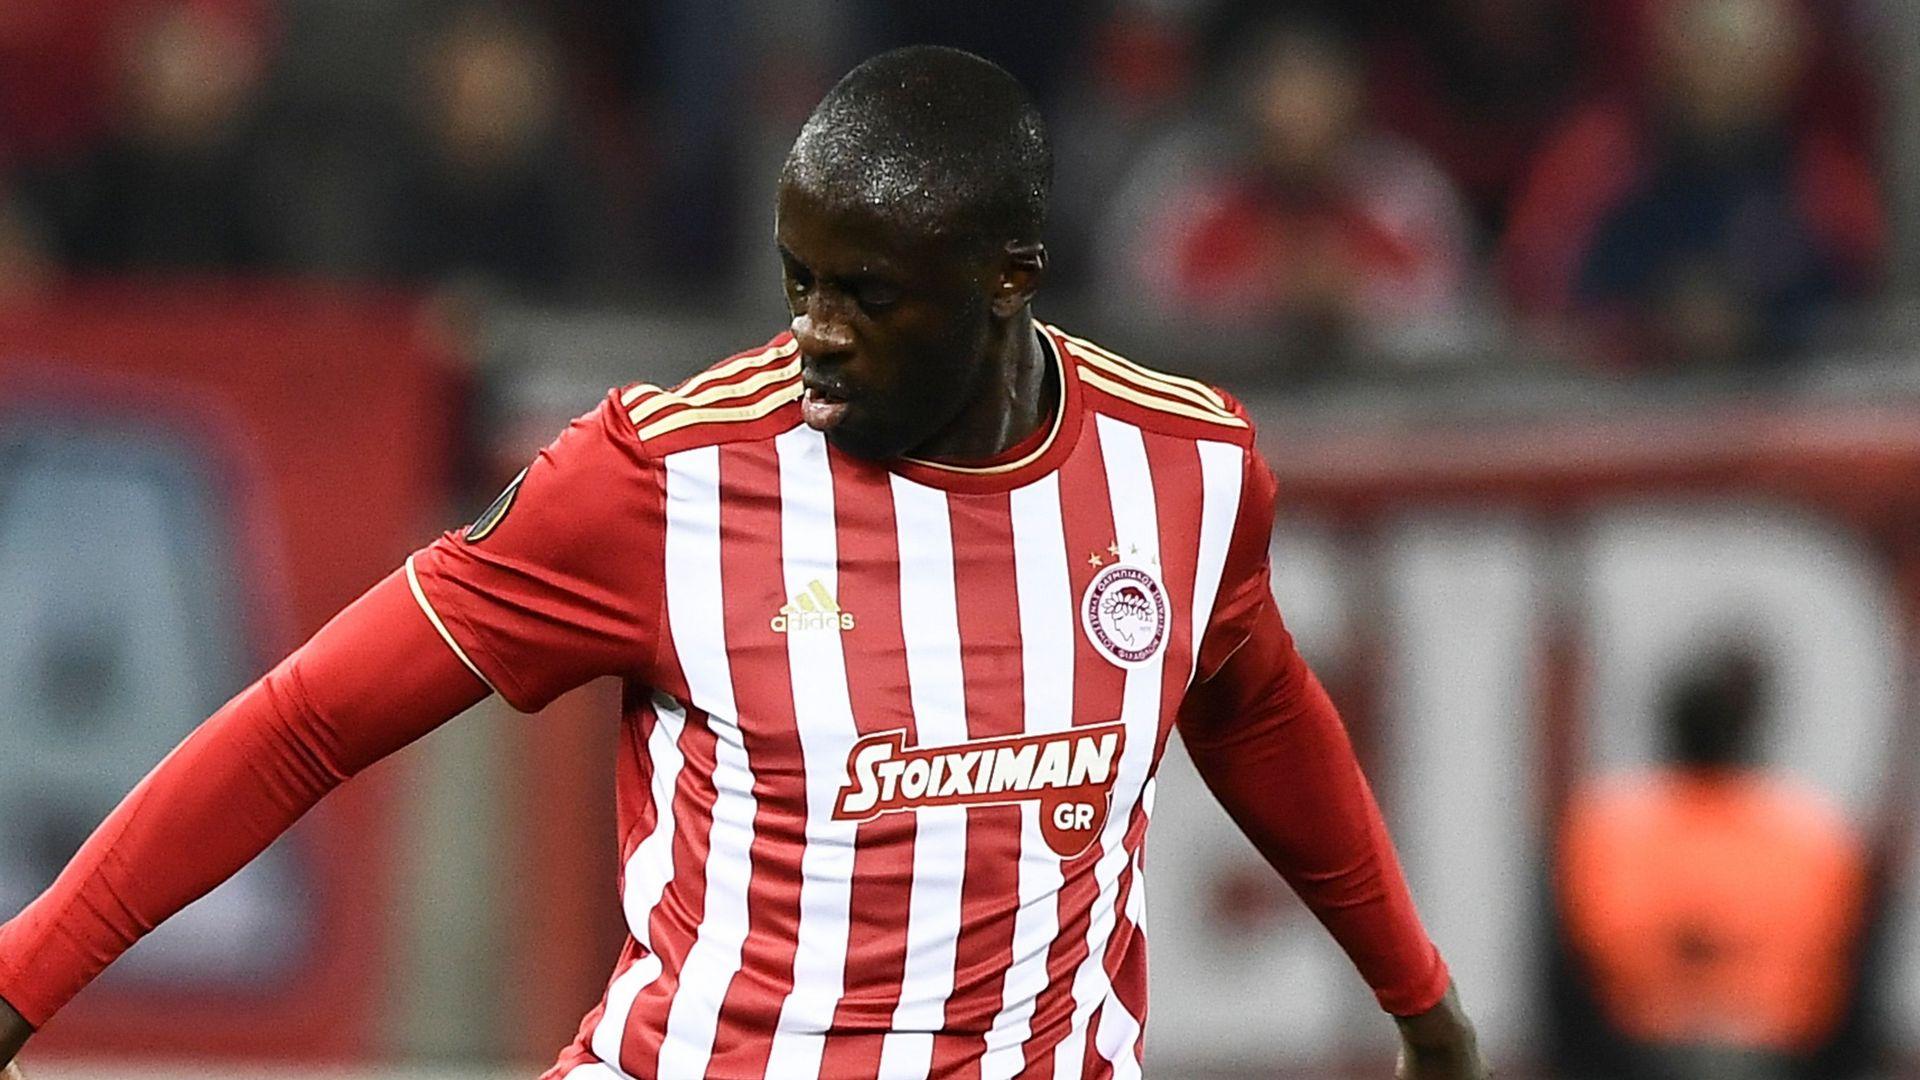 Already? Man City icon Yaya Toure cut loose by Olympiakos